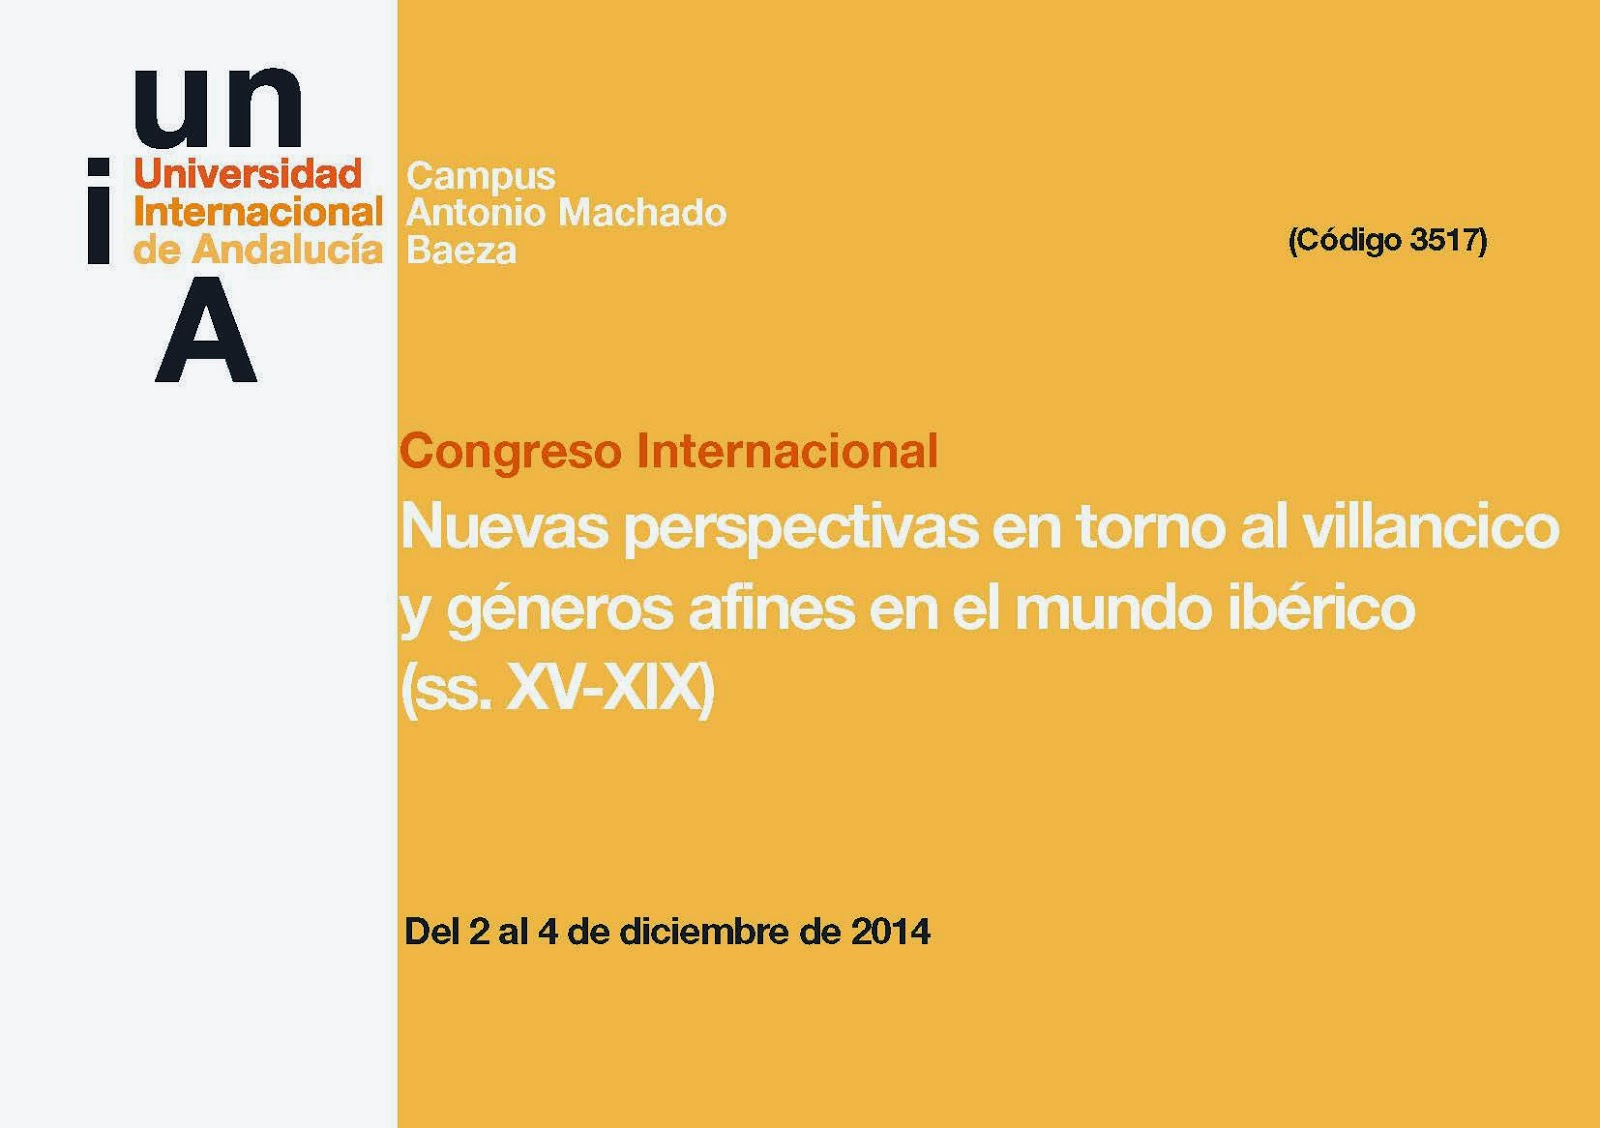 https://www.dropbox.com/s/wigxmp8c1q9vob5/congreso_villancicos_3517.pdf?dl=0